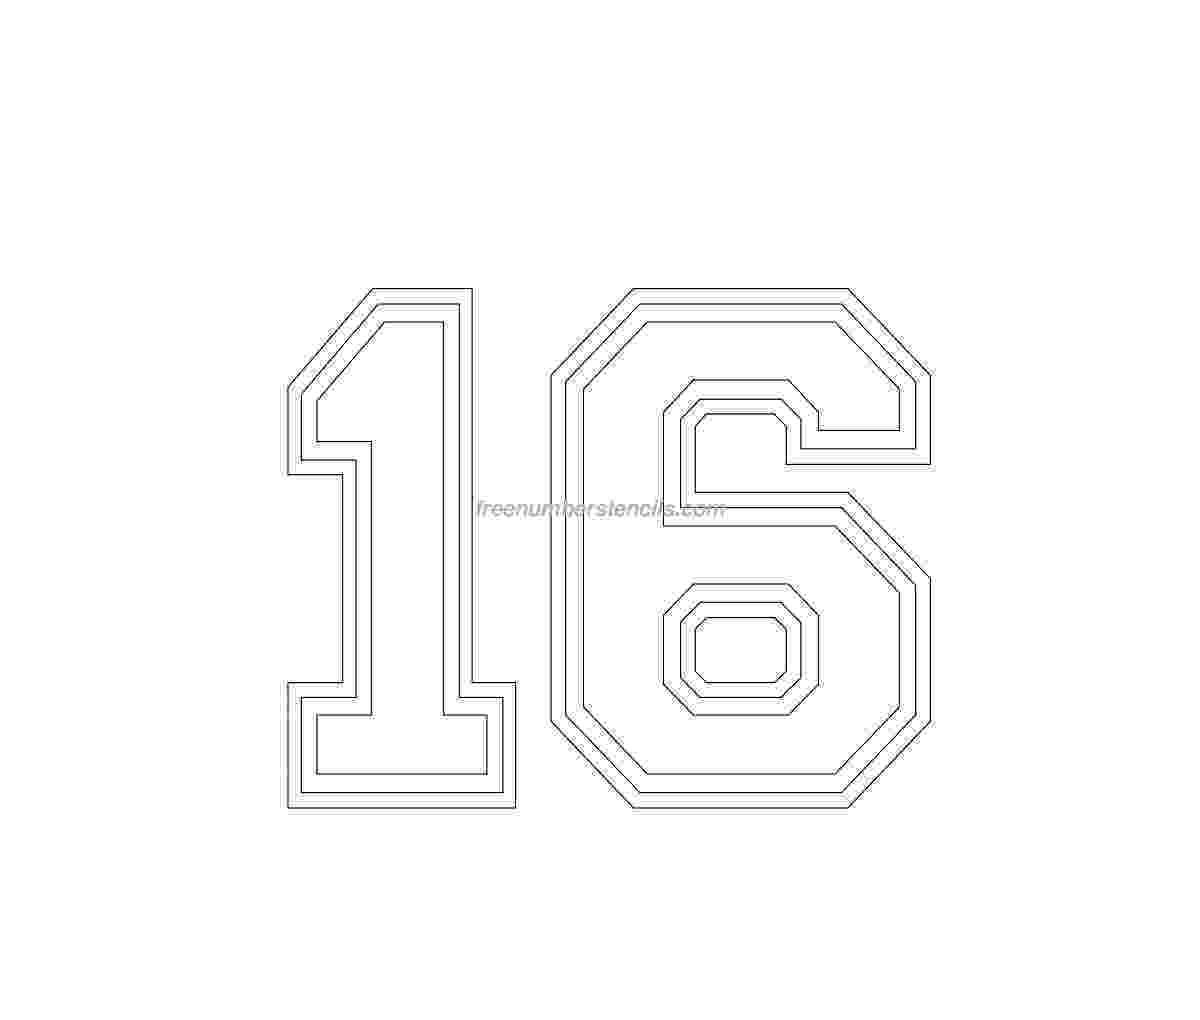 number 16 template number 16 template gallery template 16 number 1 1